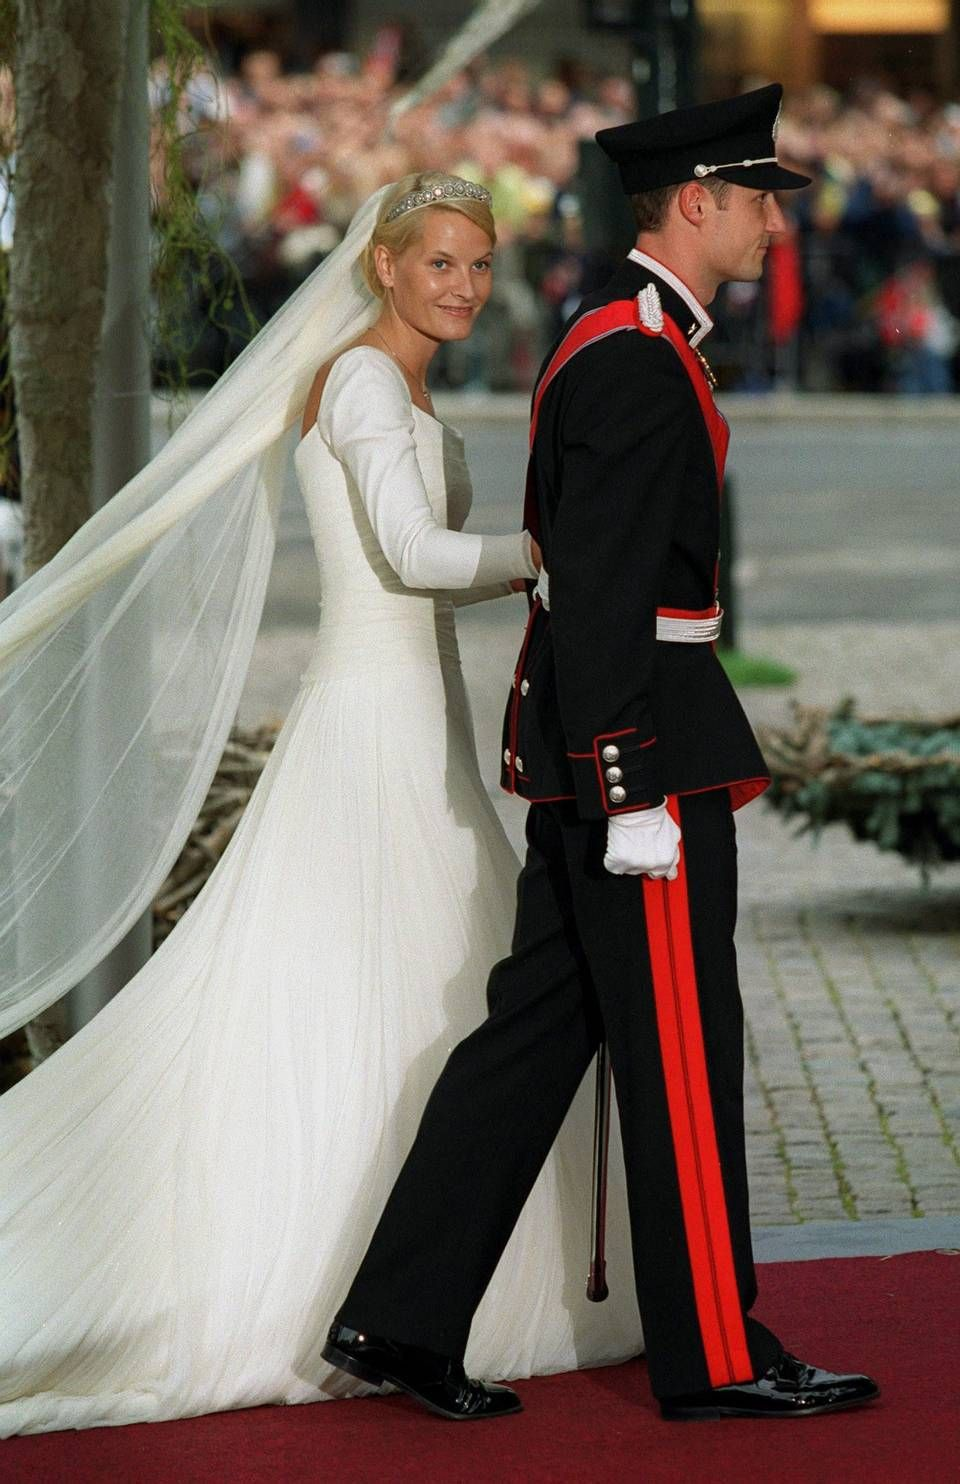 Resultado de imagen de Mette Marit Tjessem boda